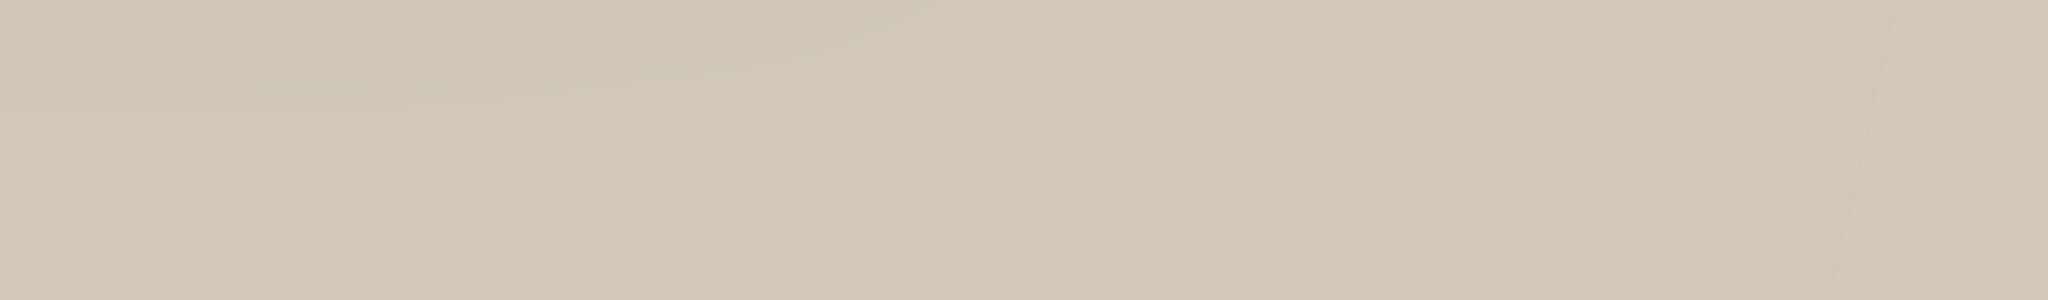 HU 18161 ABS-rand Dafne-bruin glad glans 90°